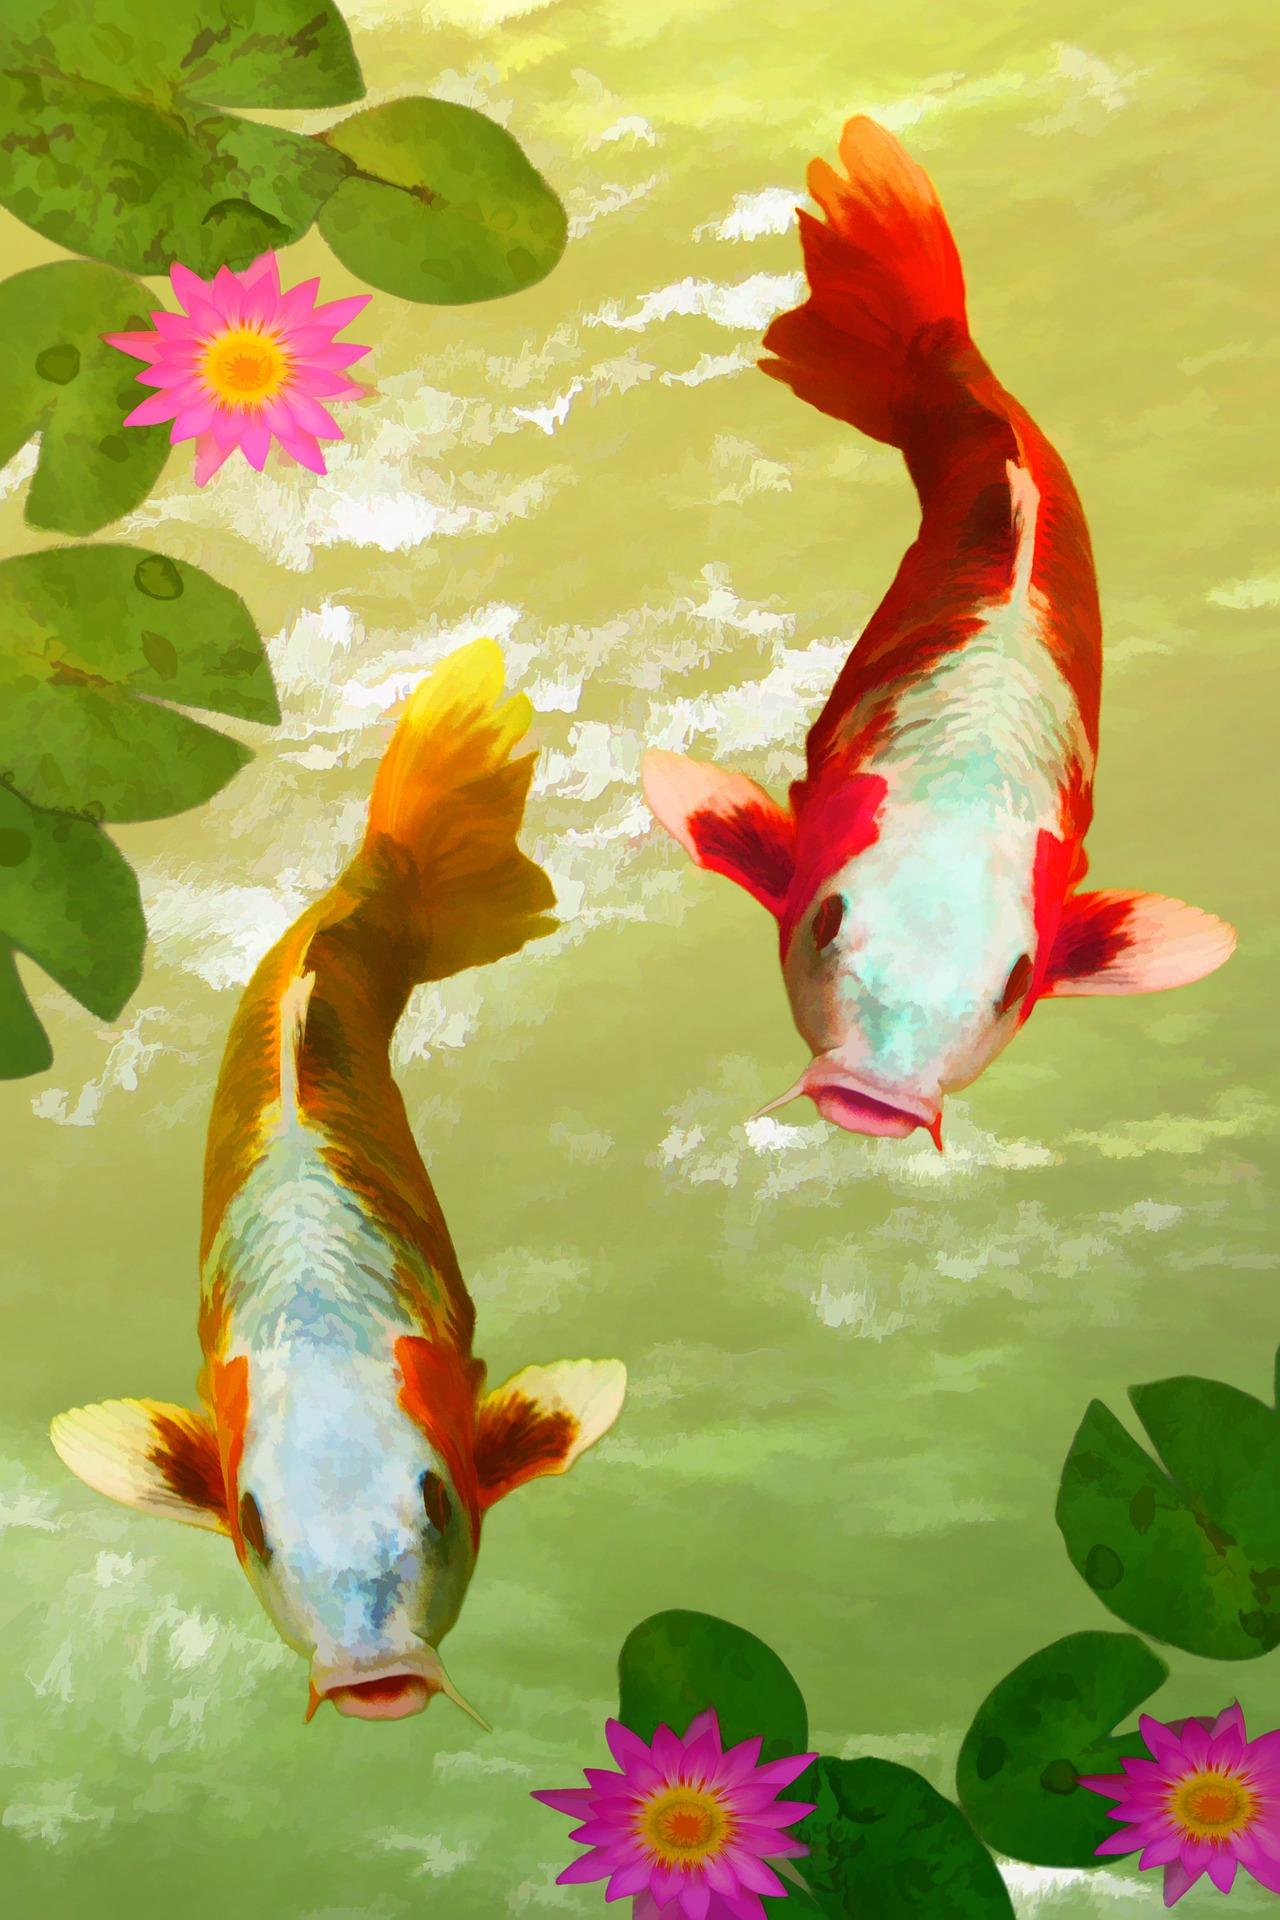 fish-884694_1920